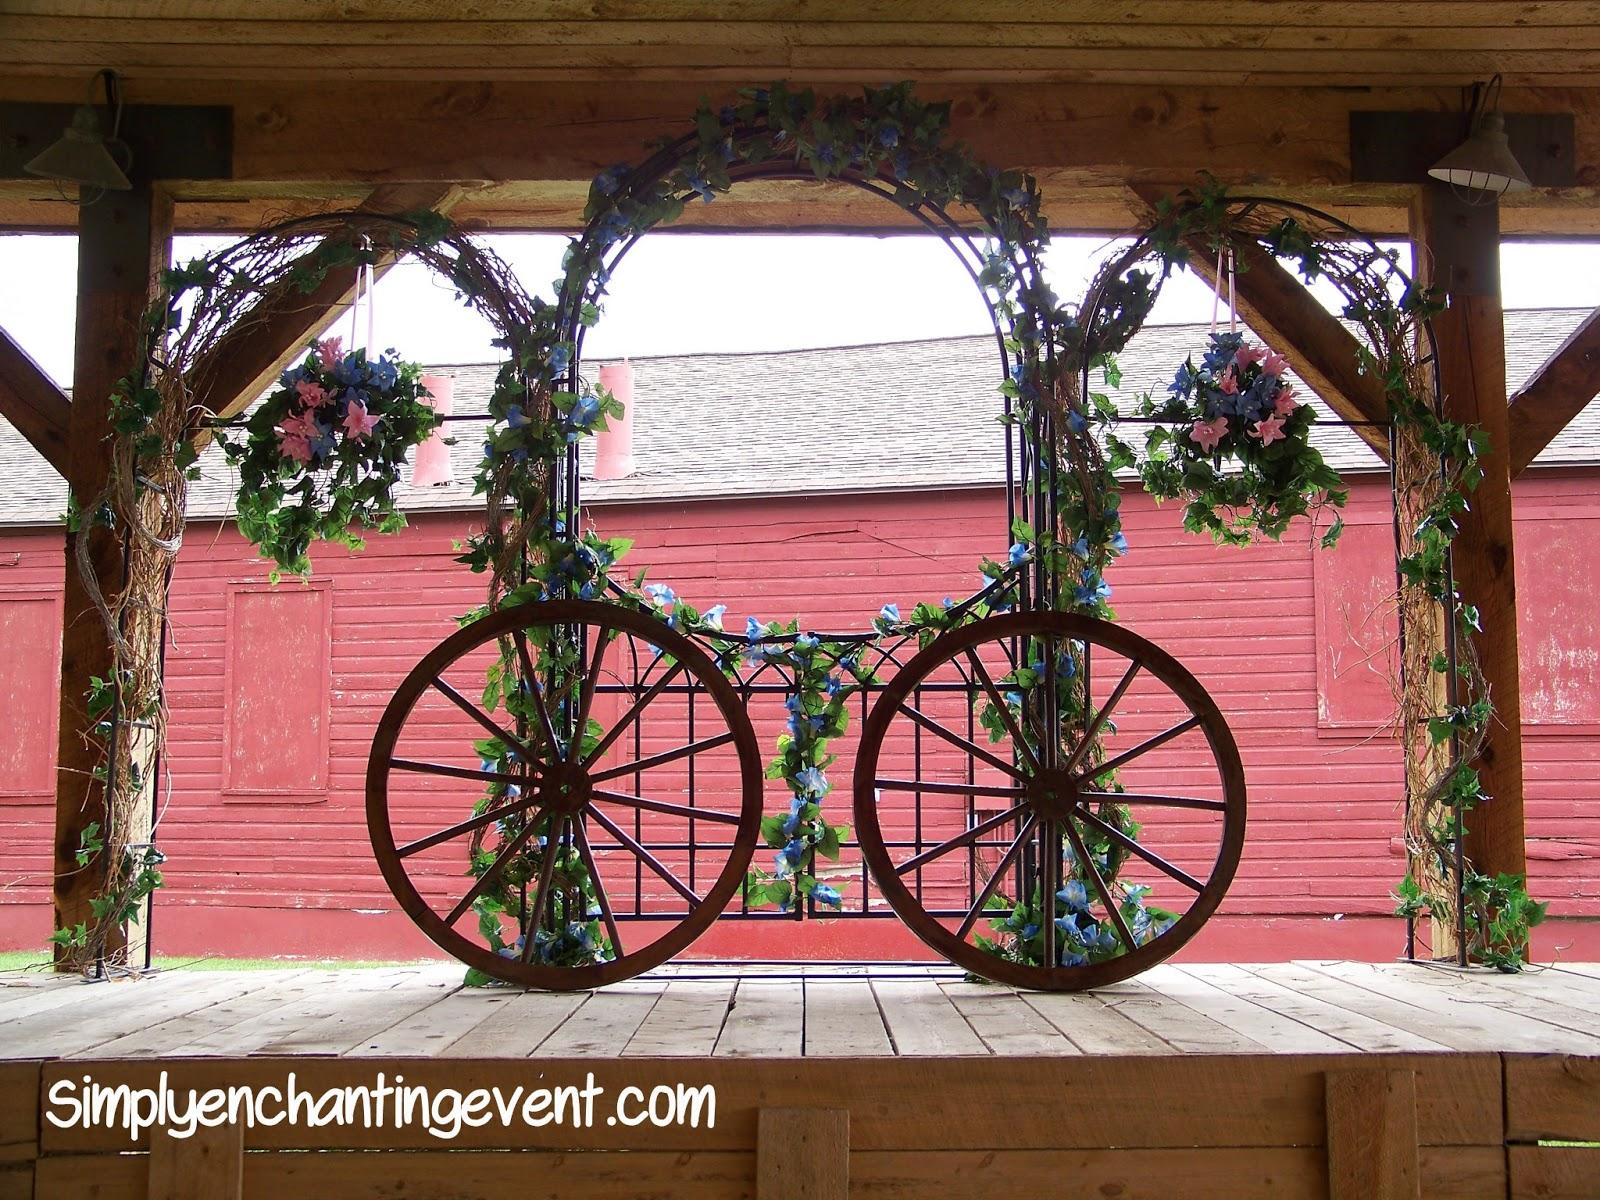 Simply Enchanting Event: Popular Wedding Backdrops